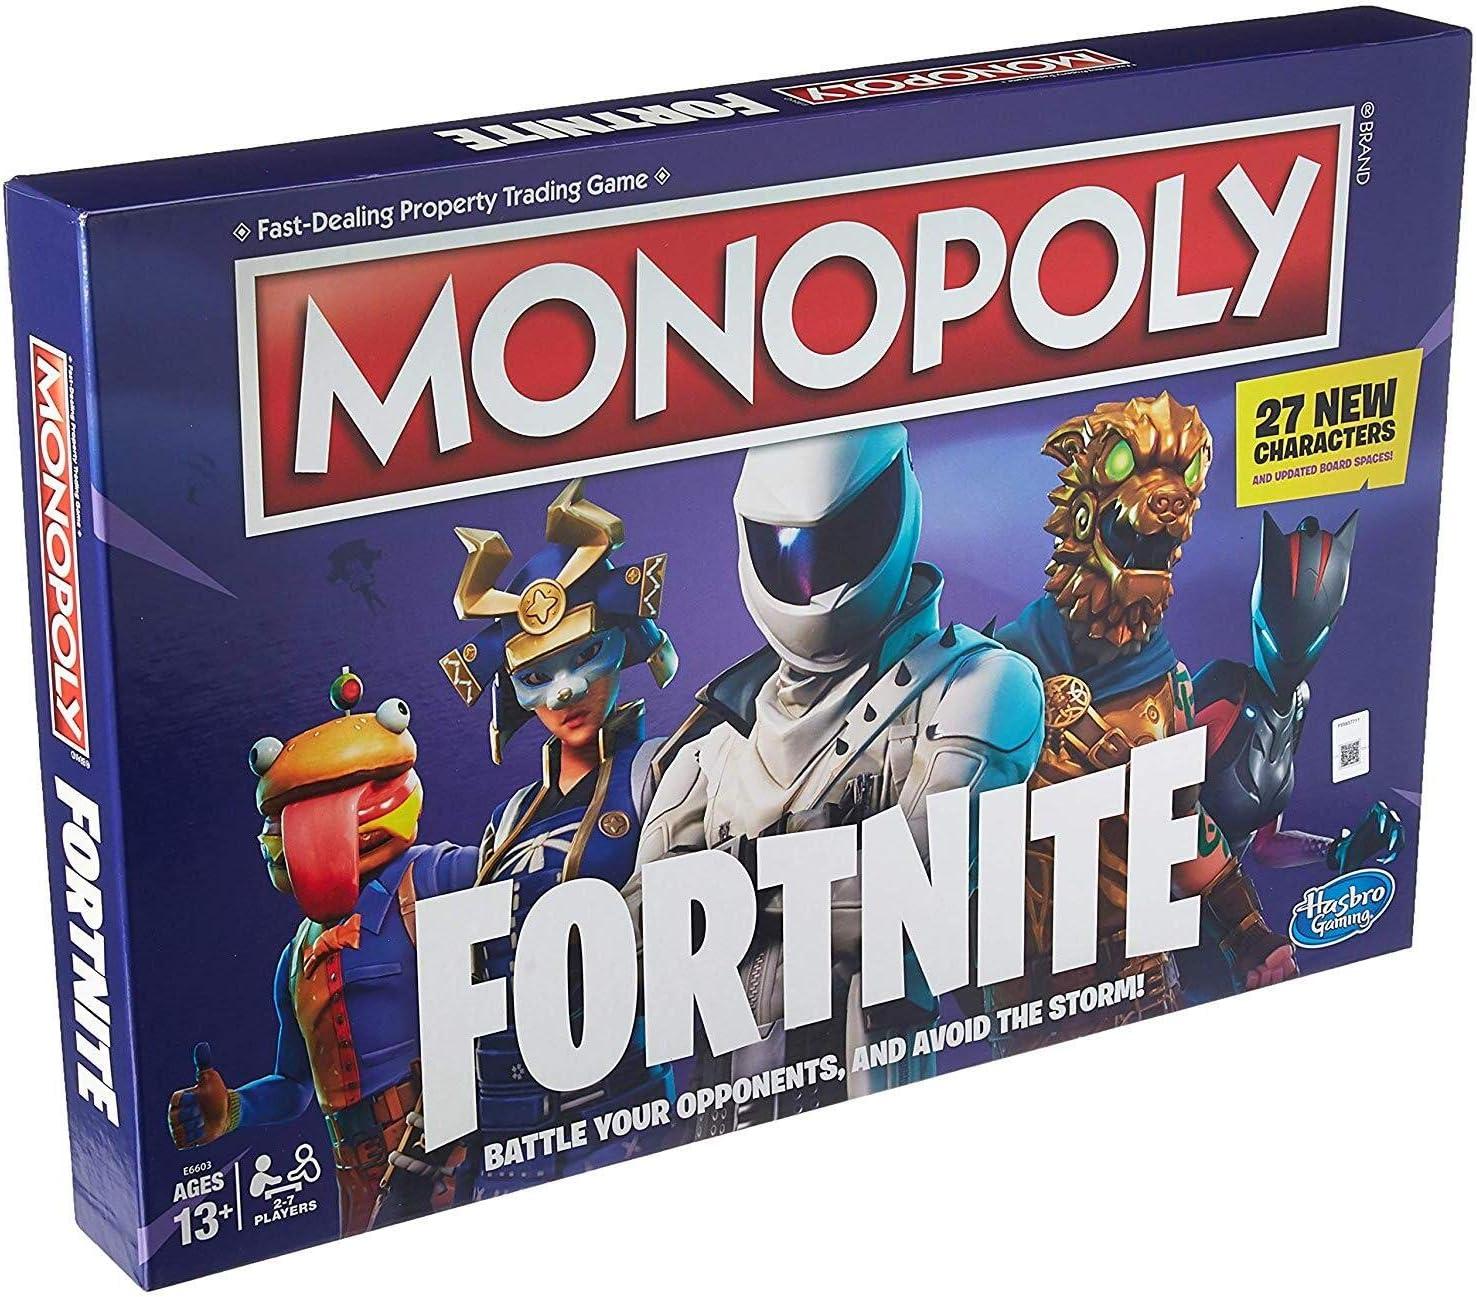 19. Monopoly: Fortnite Edition Board Game